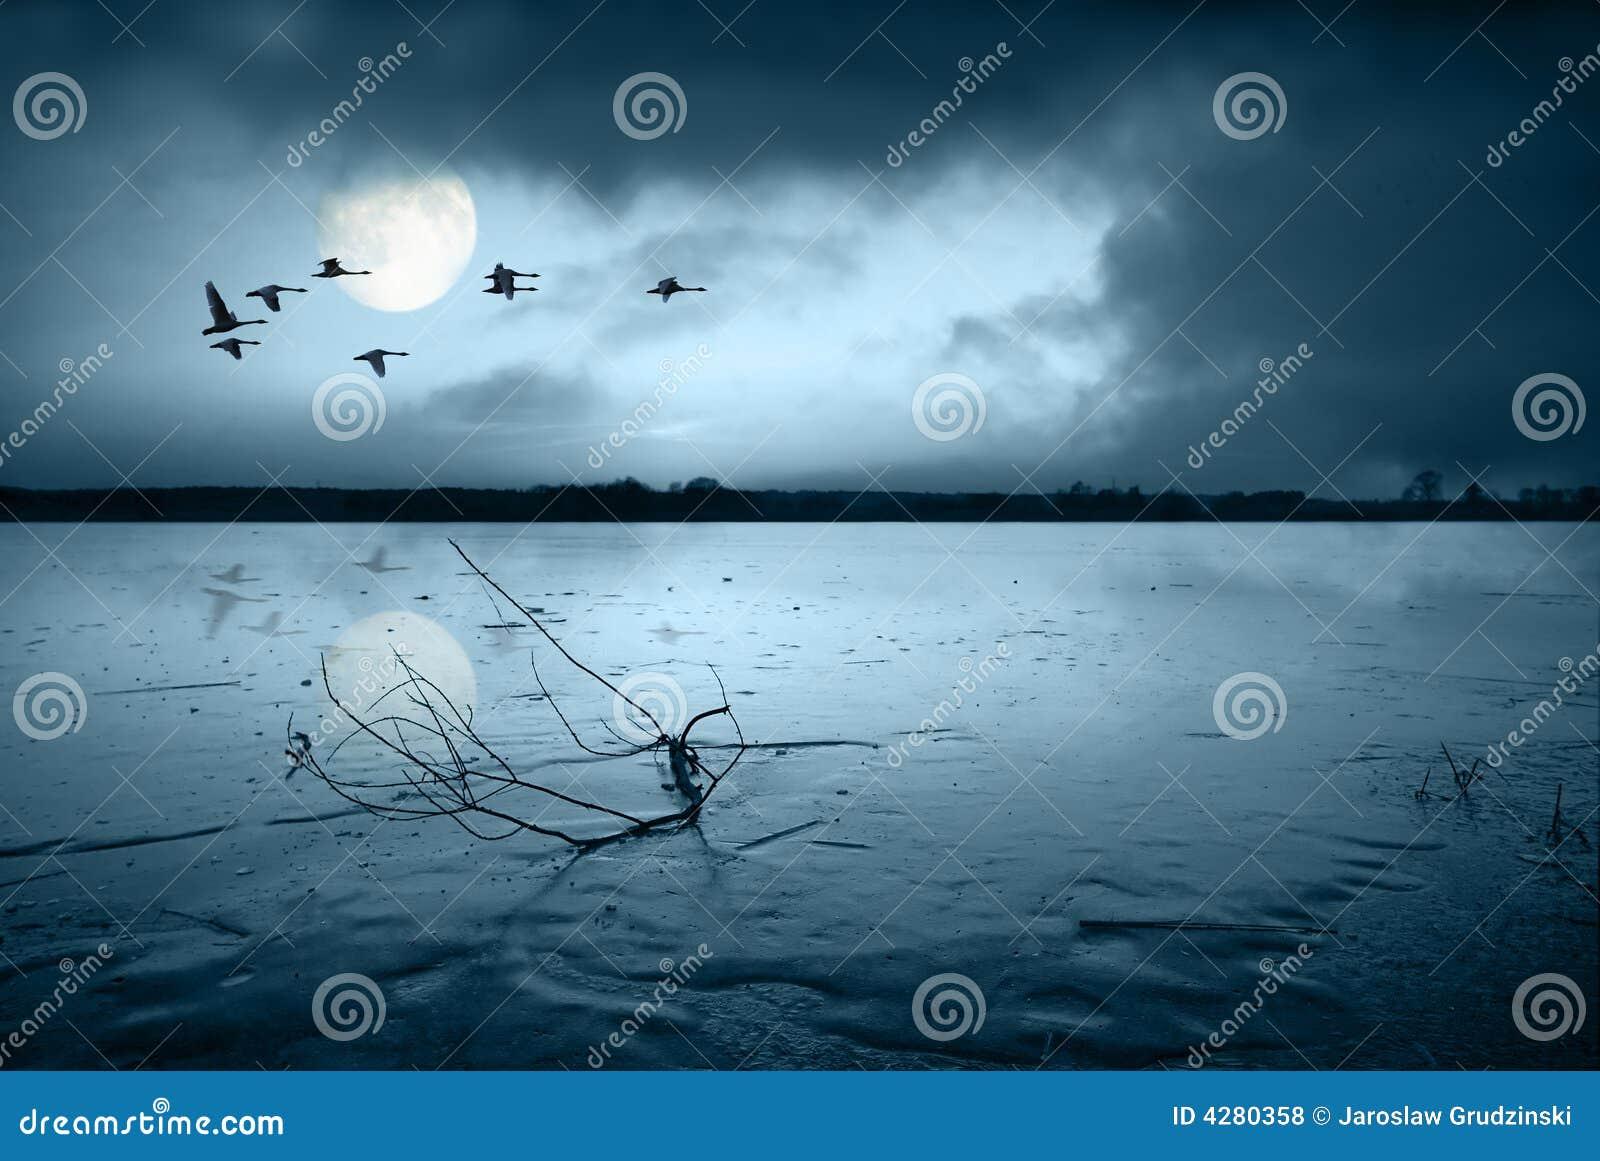 Download Frozen lake in moonlight stock photo. Image of frozen - 4280358